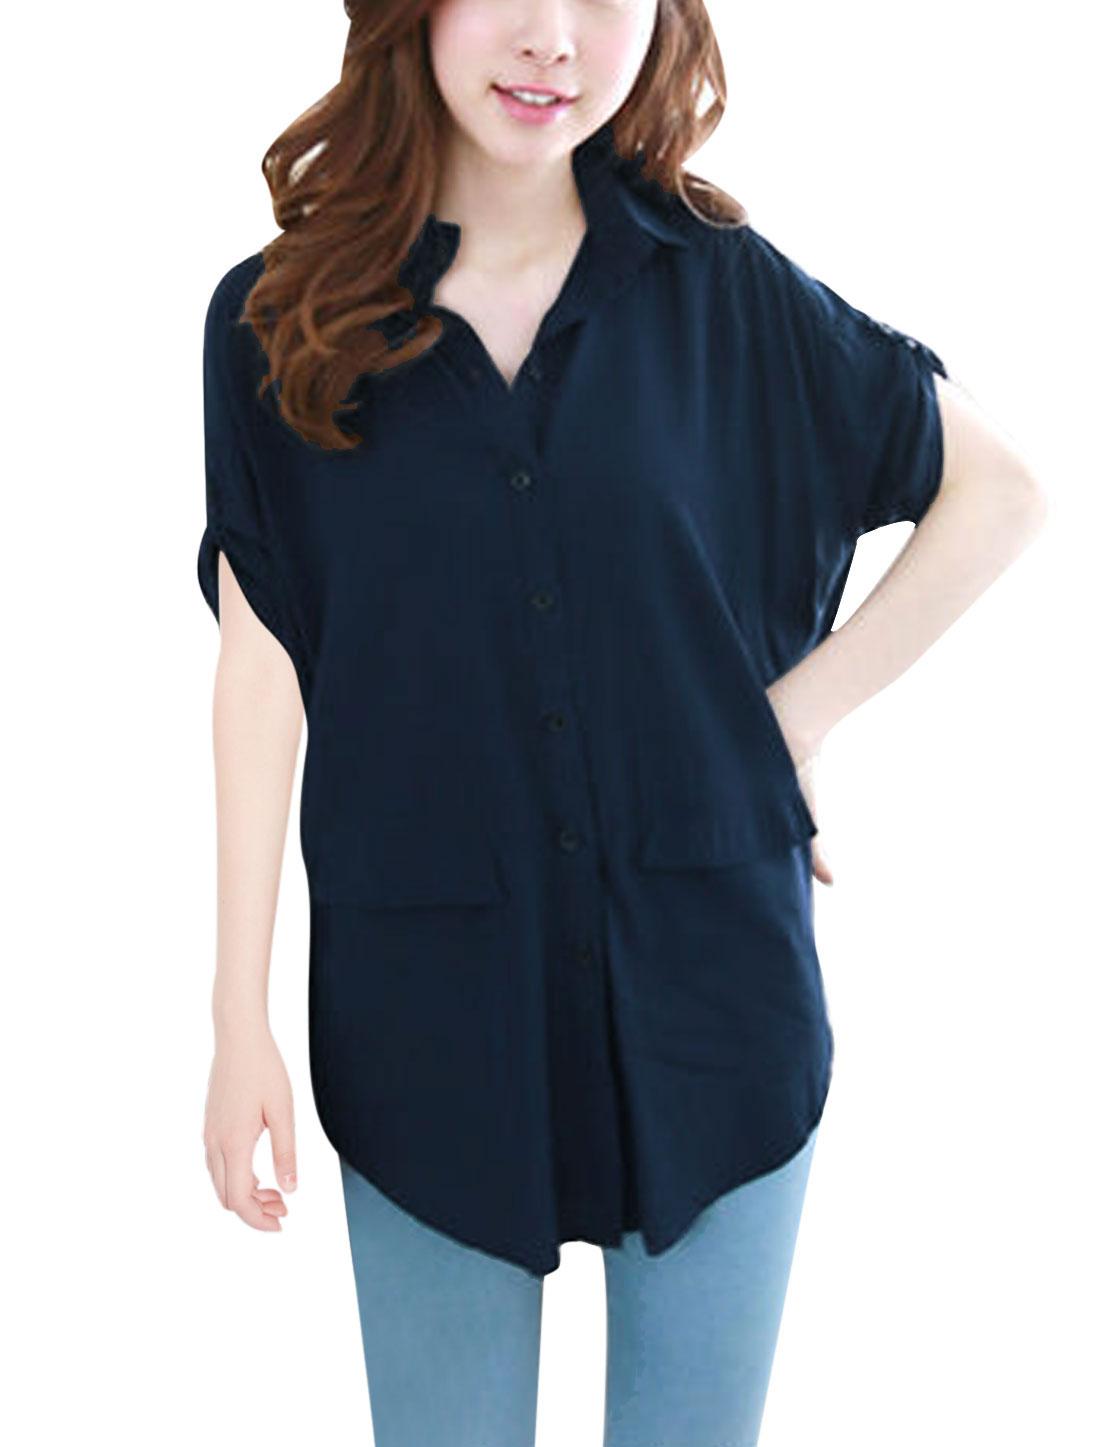 Lady Fake Flap Pockets Round Hem Single Breasted Sweet Top Shirt Navy Blue S